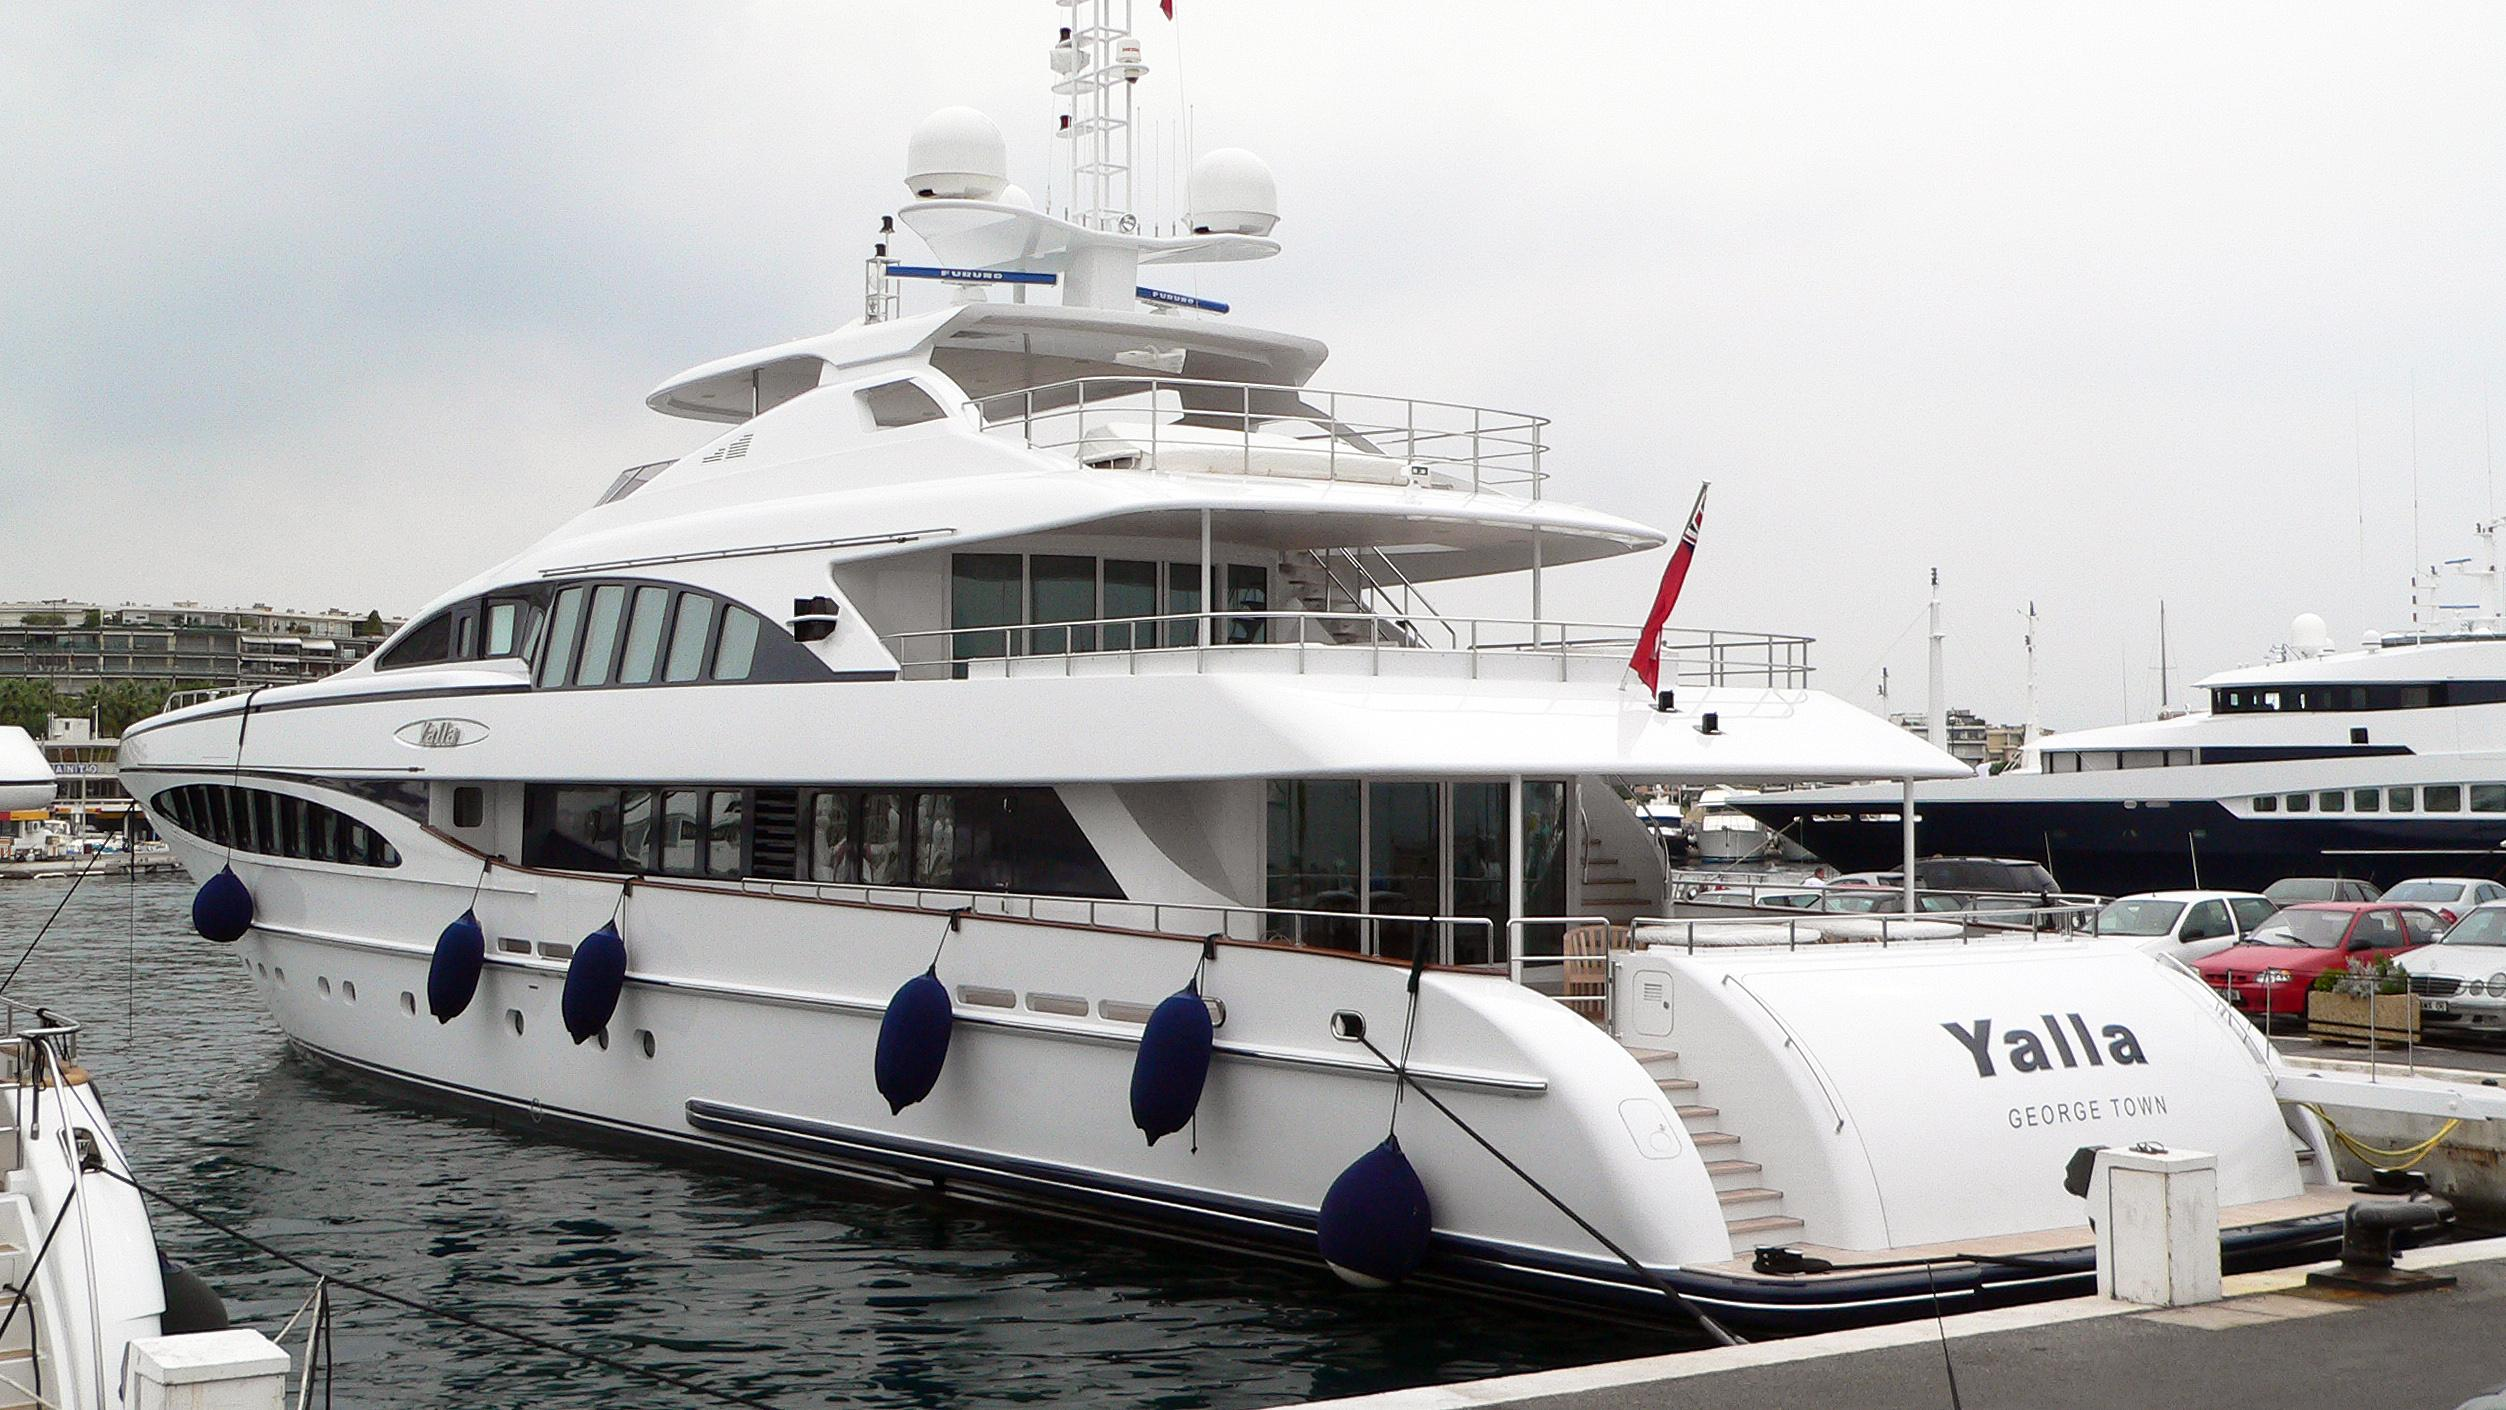 yalla-motor-yacht-heesen-2004-47m-stern.jpg